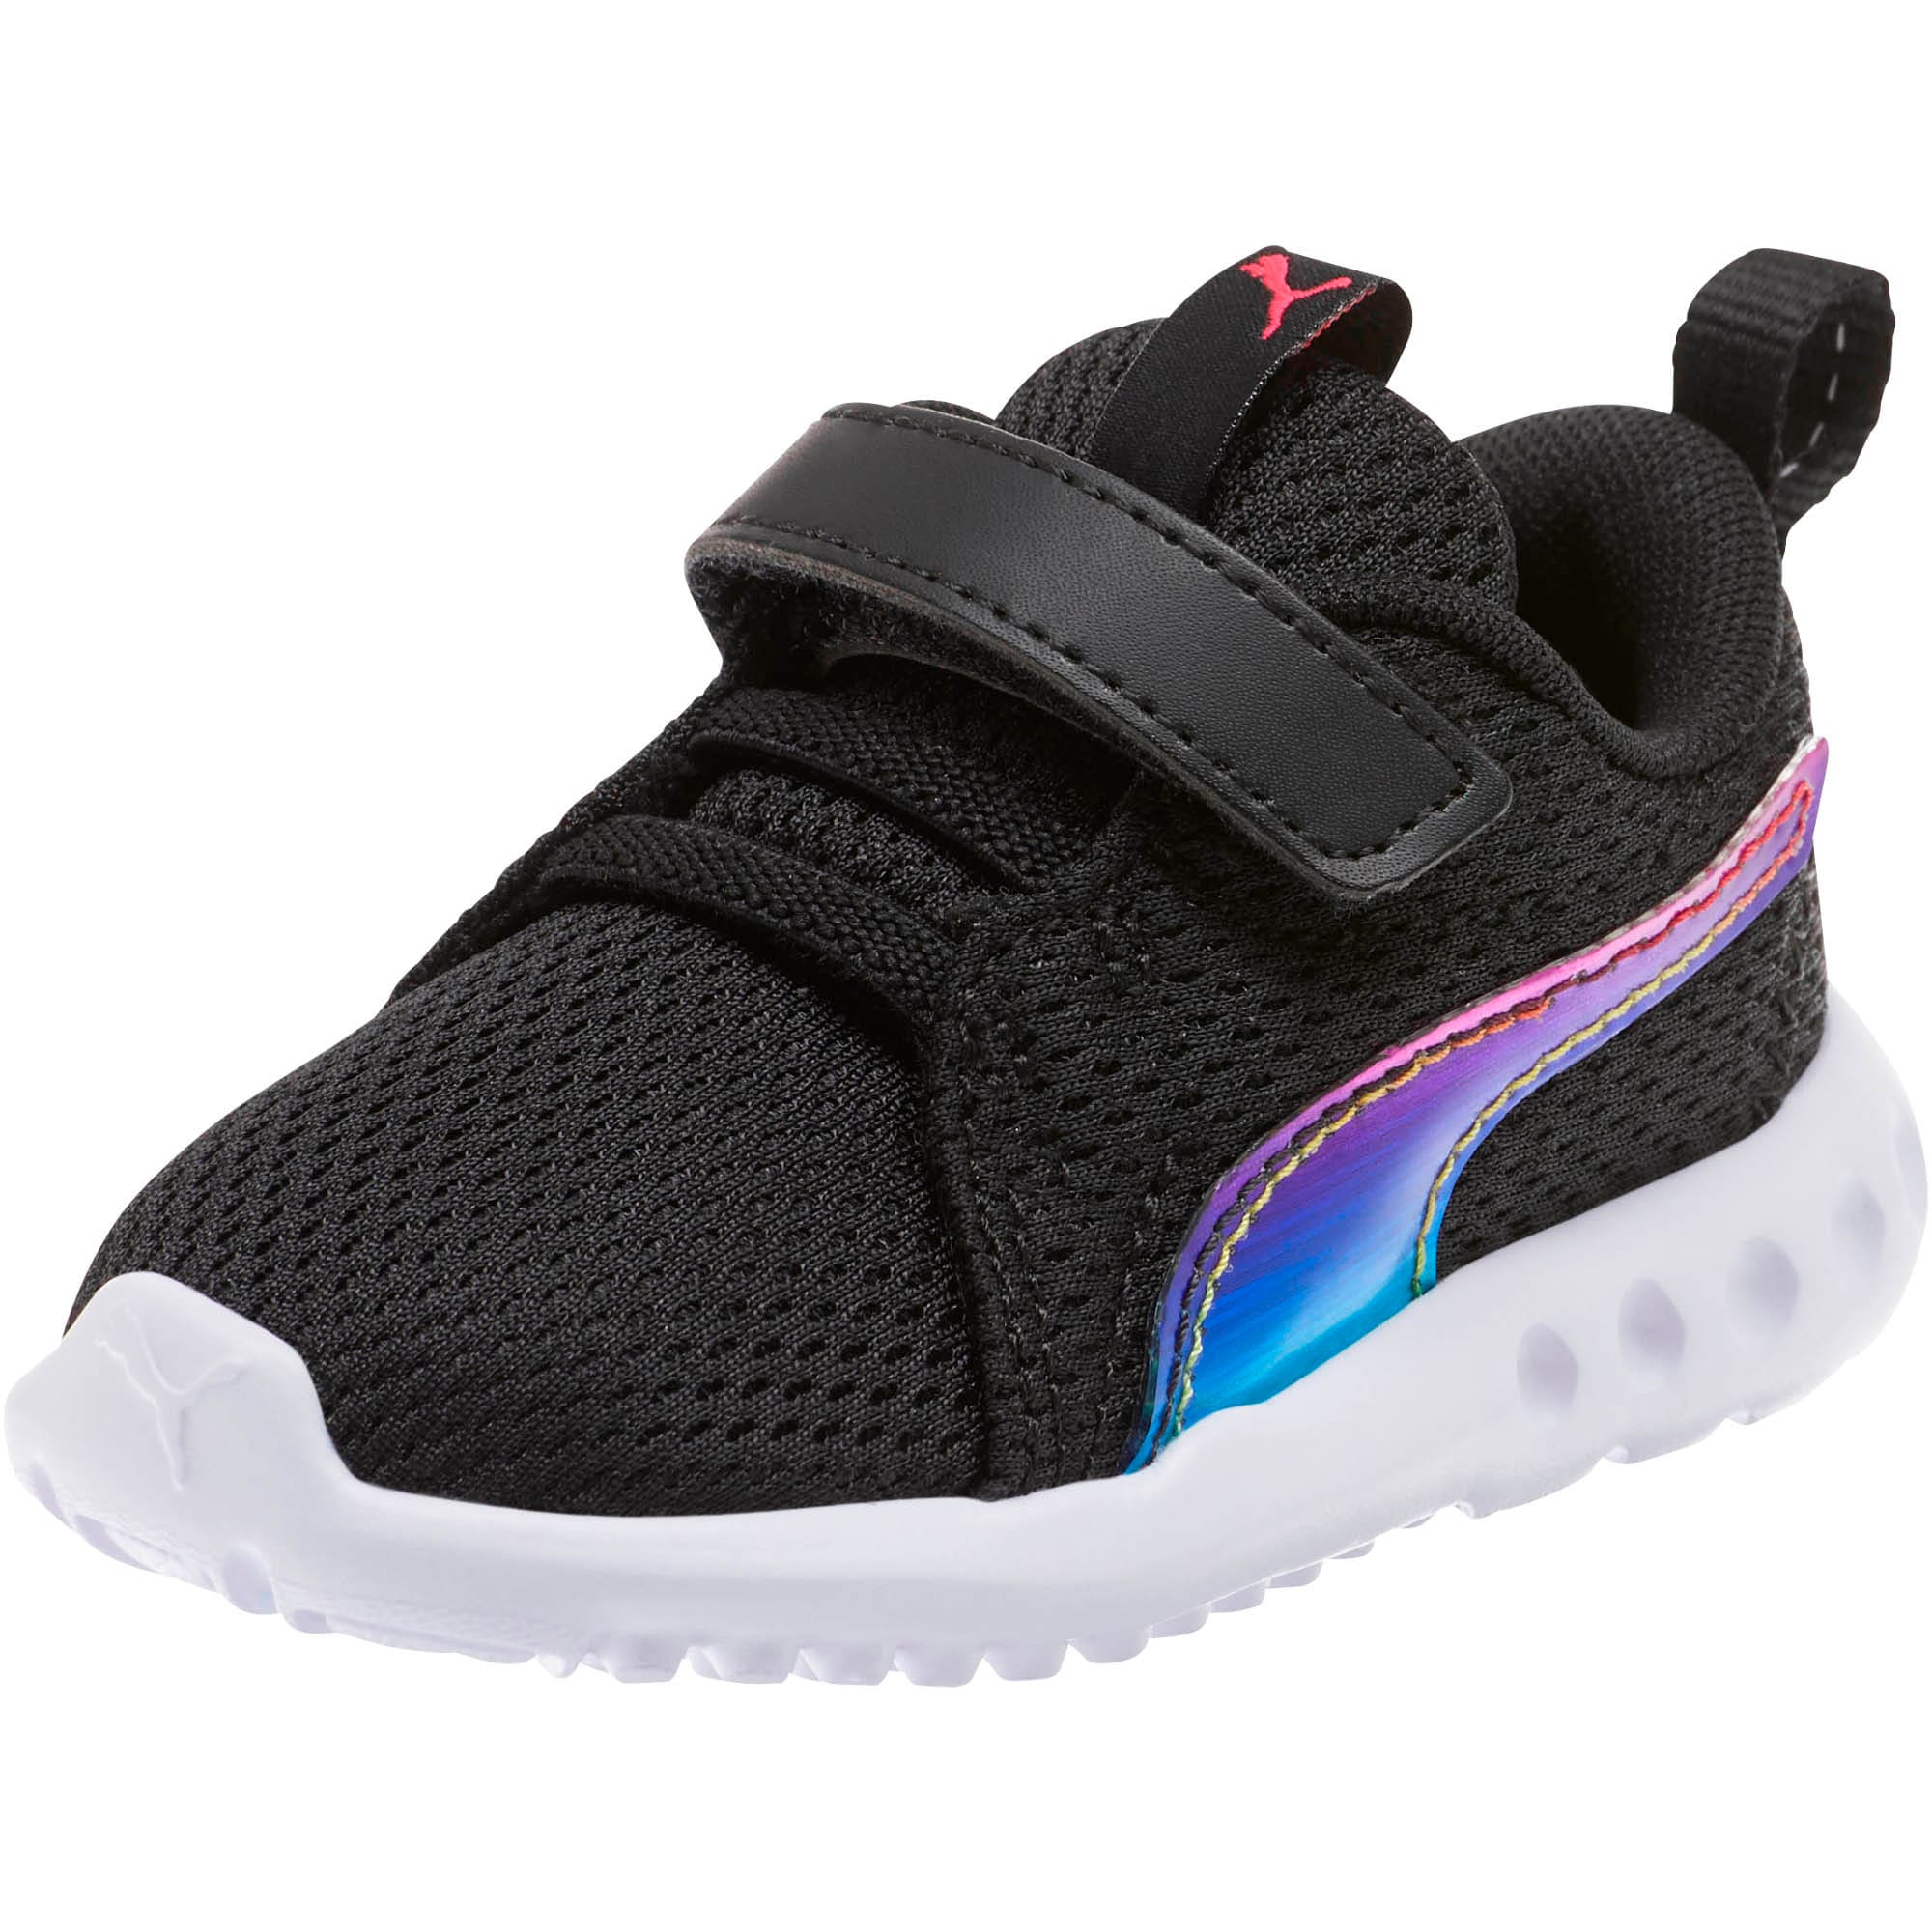 Thumbnail 1 of Carson 2 Iridescent Toddler Shoes, Puma Black-Puma White, medium